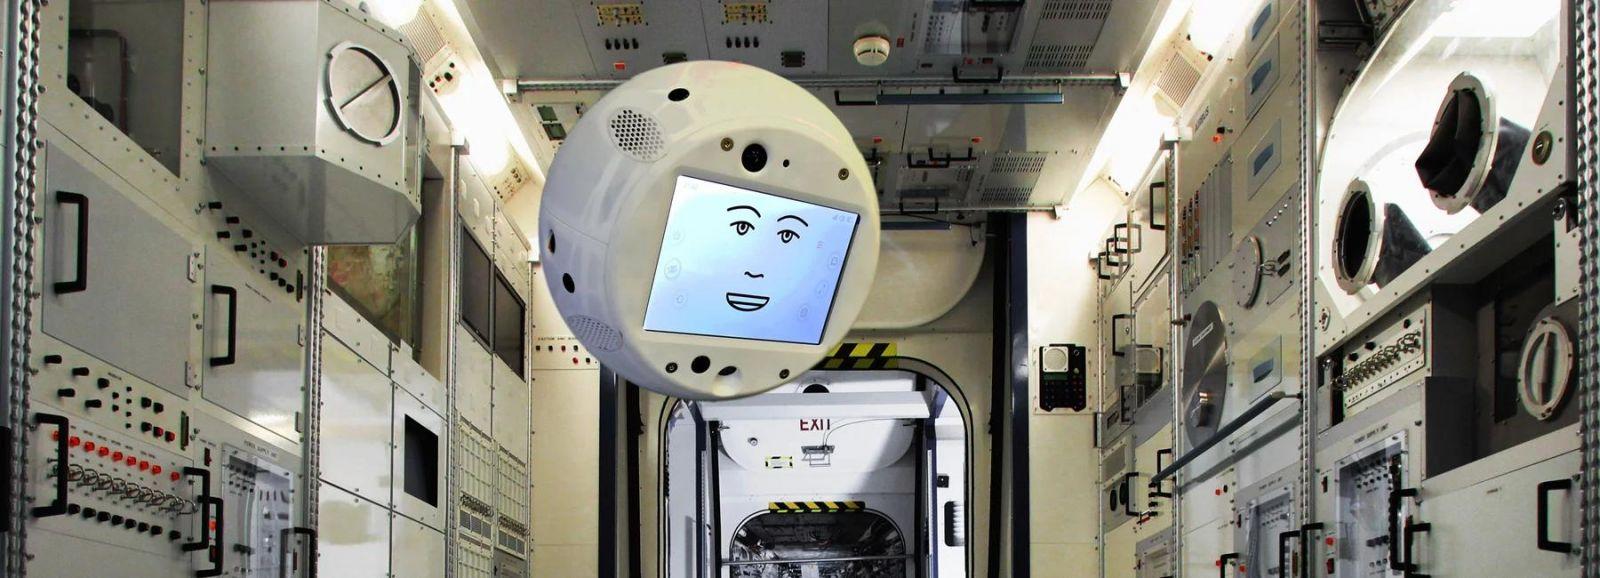 Робот CIMON, фото: Designboom